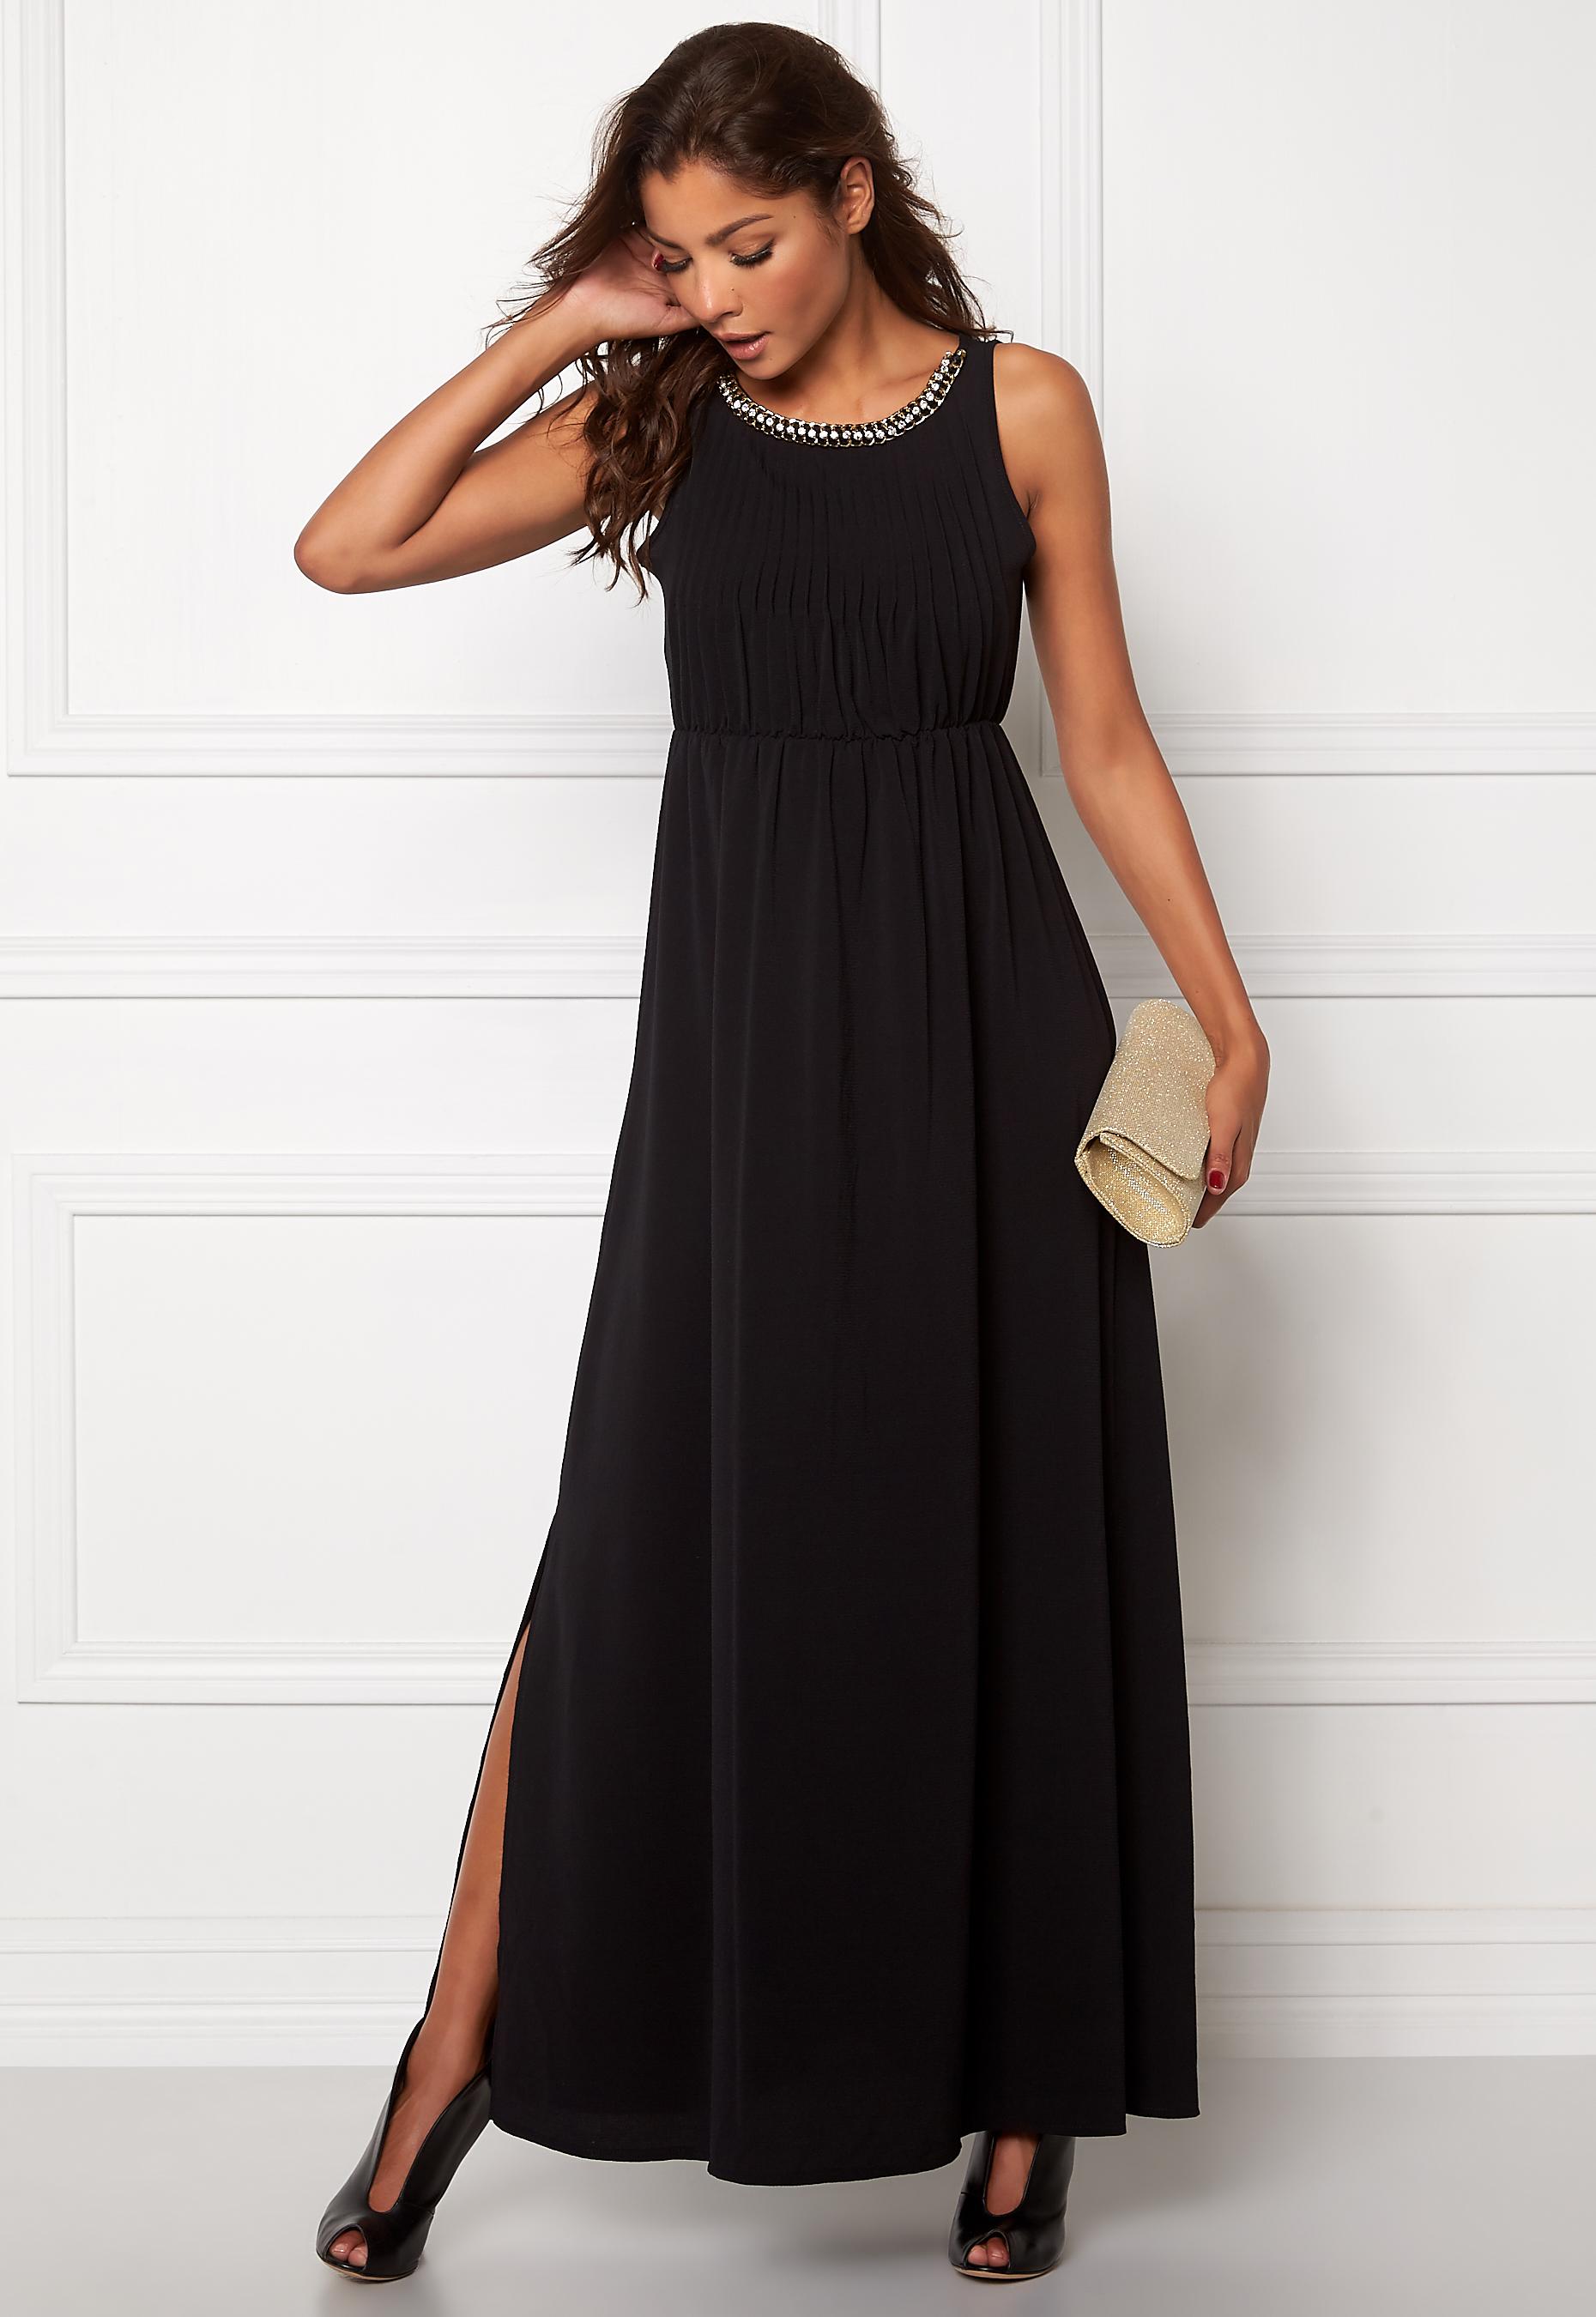 0ed4736b Chiara Forthi Aurely Evening Gown Black / Gold - Bubbleroom